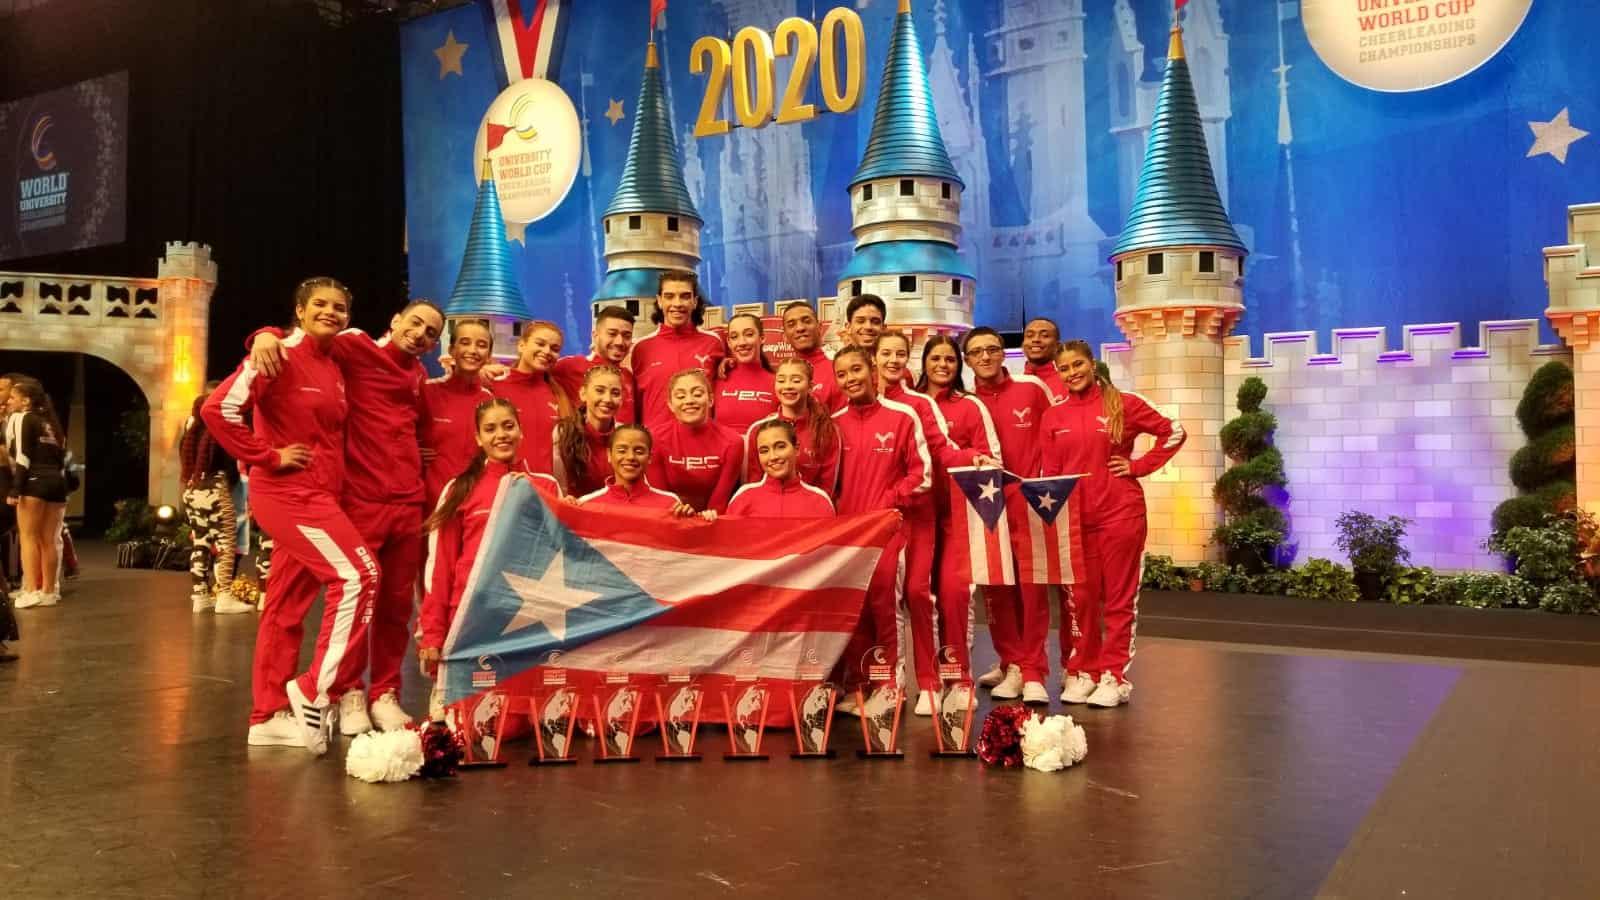 El UPRRP Dance Team avanza a finales de competencia nacional